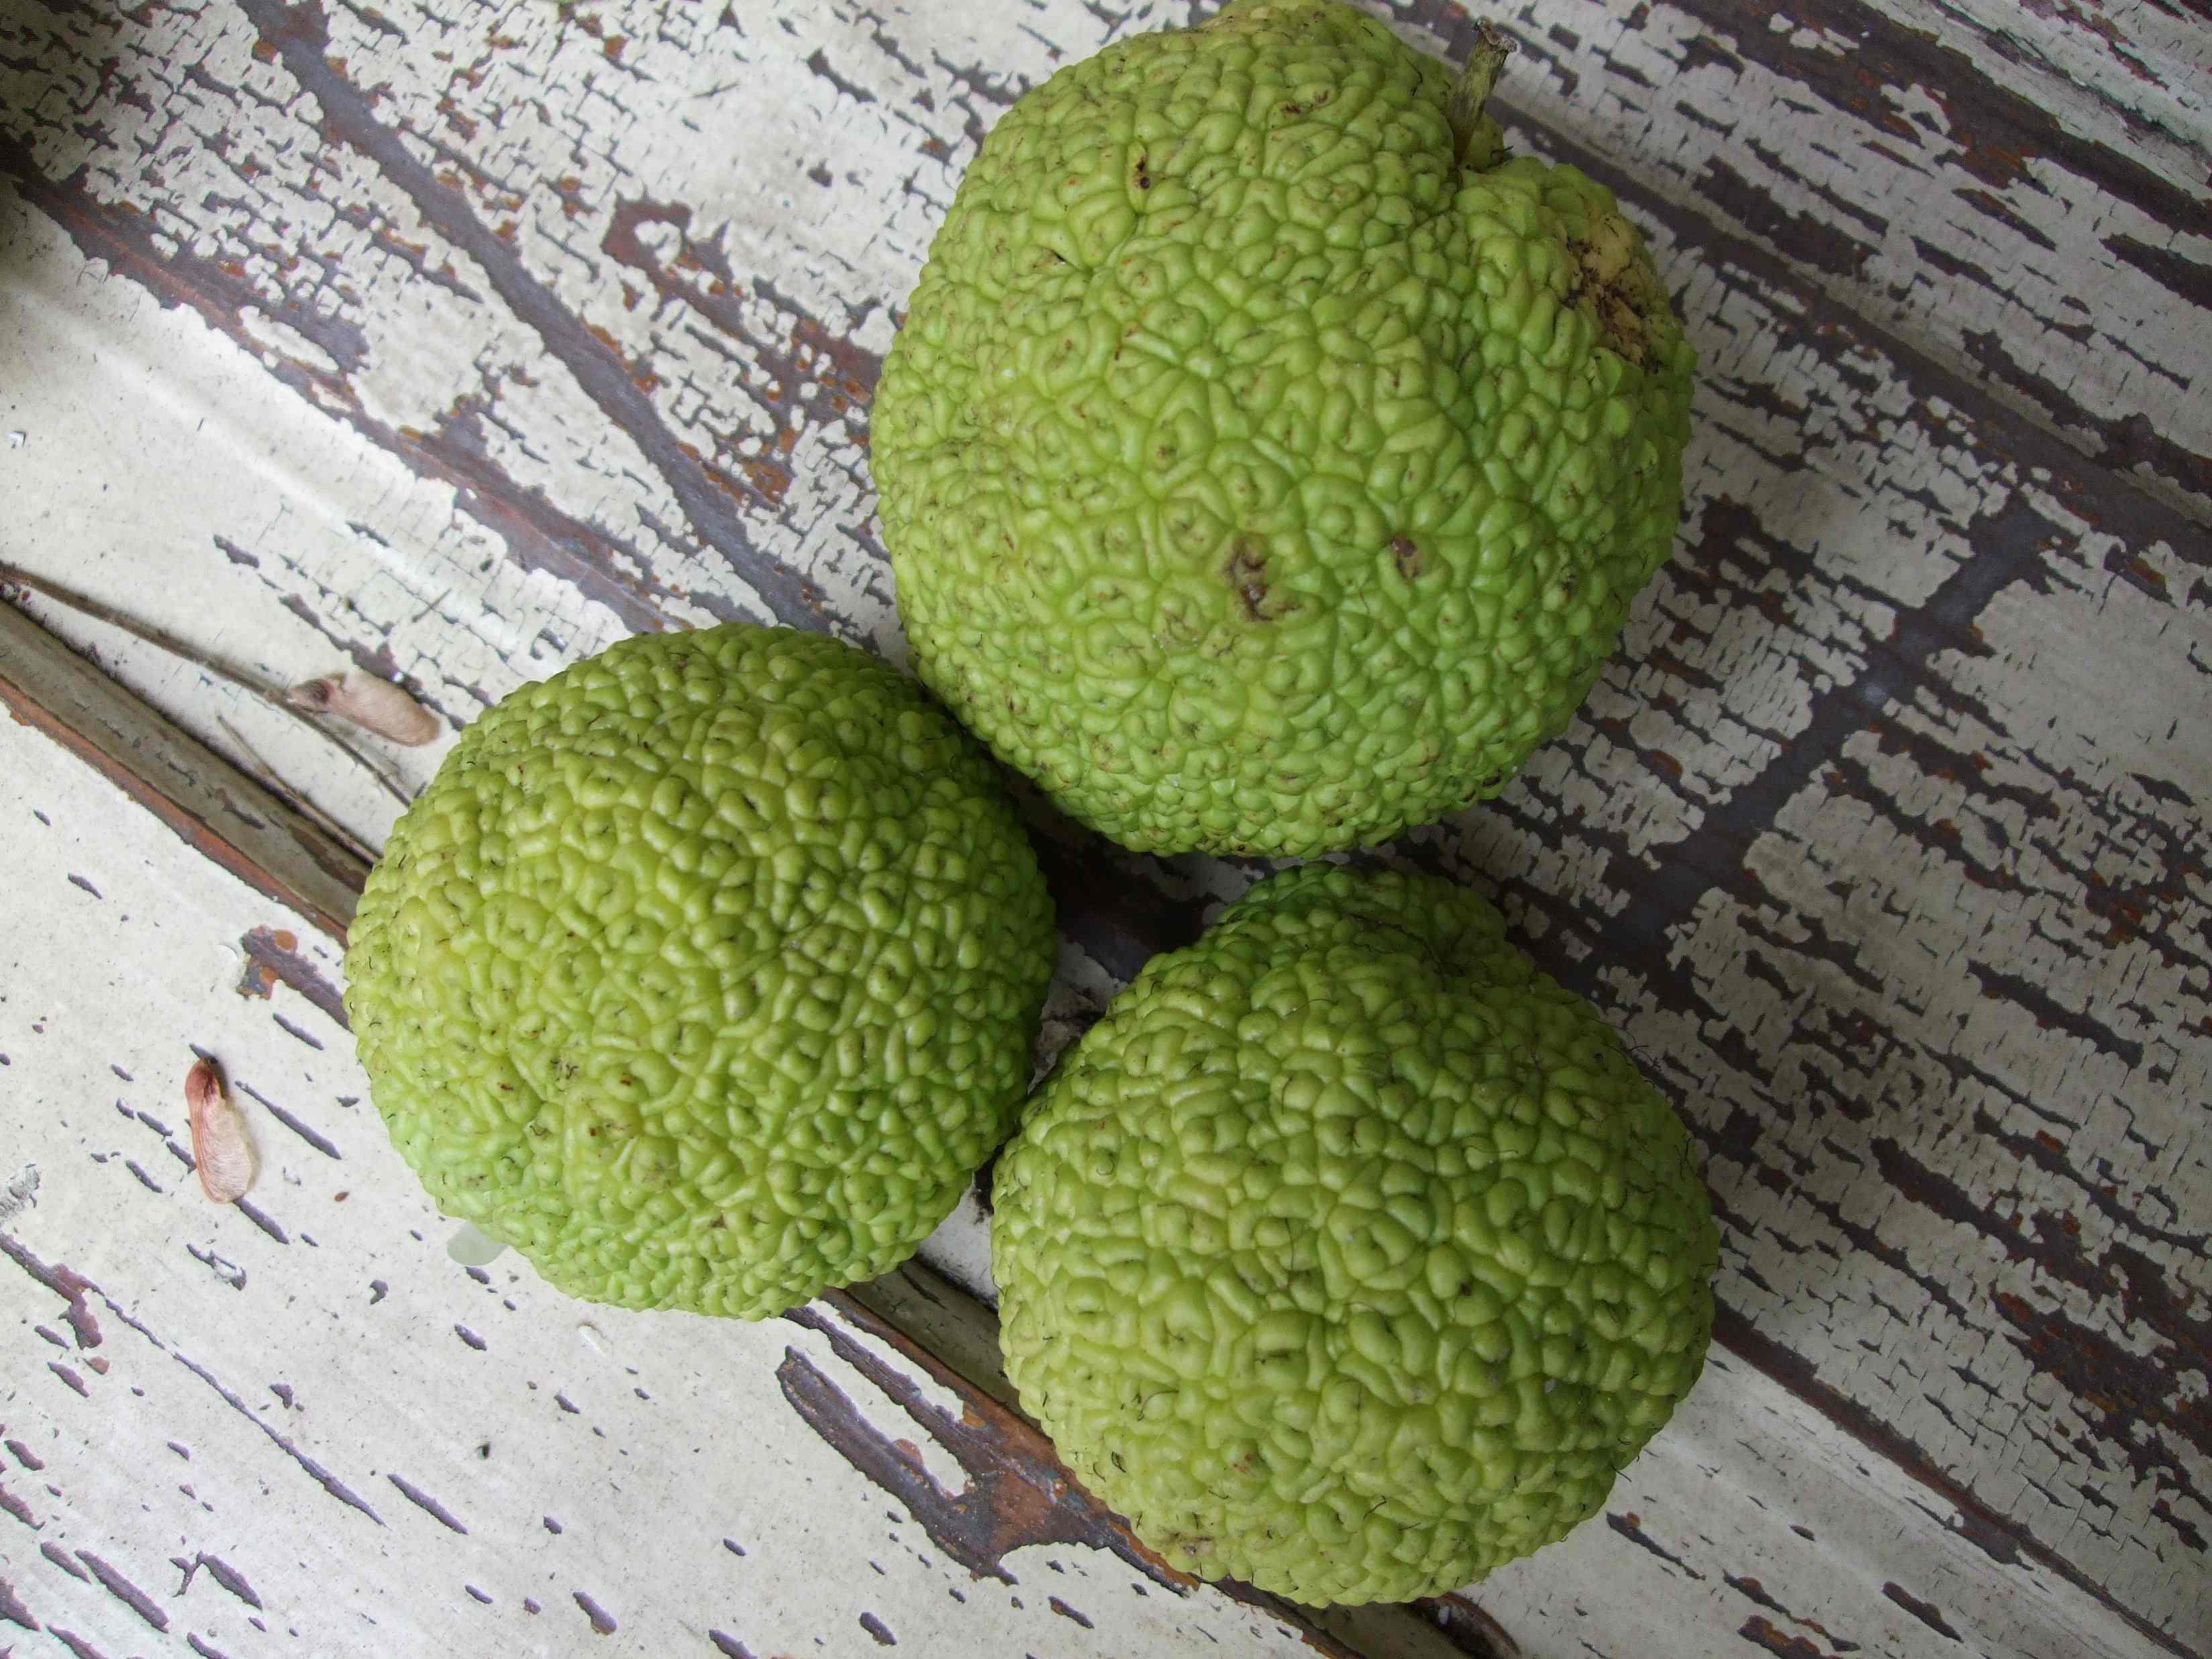 monkeyballs